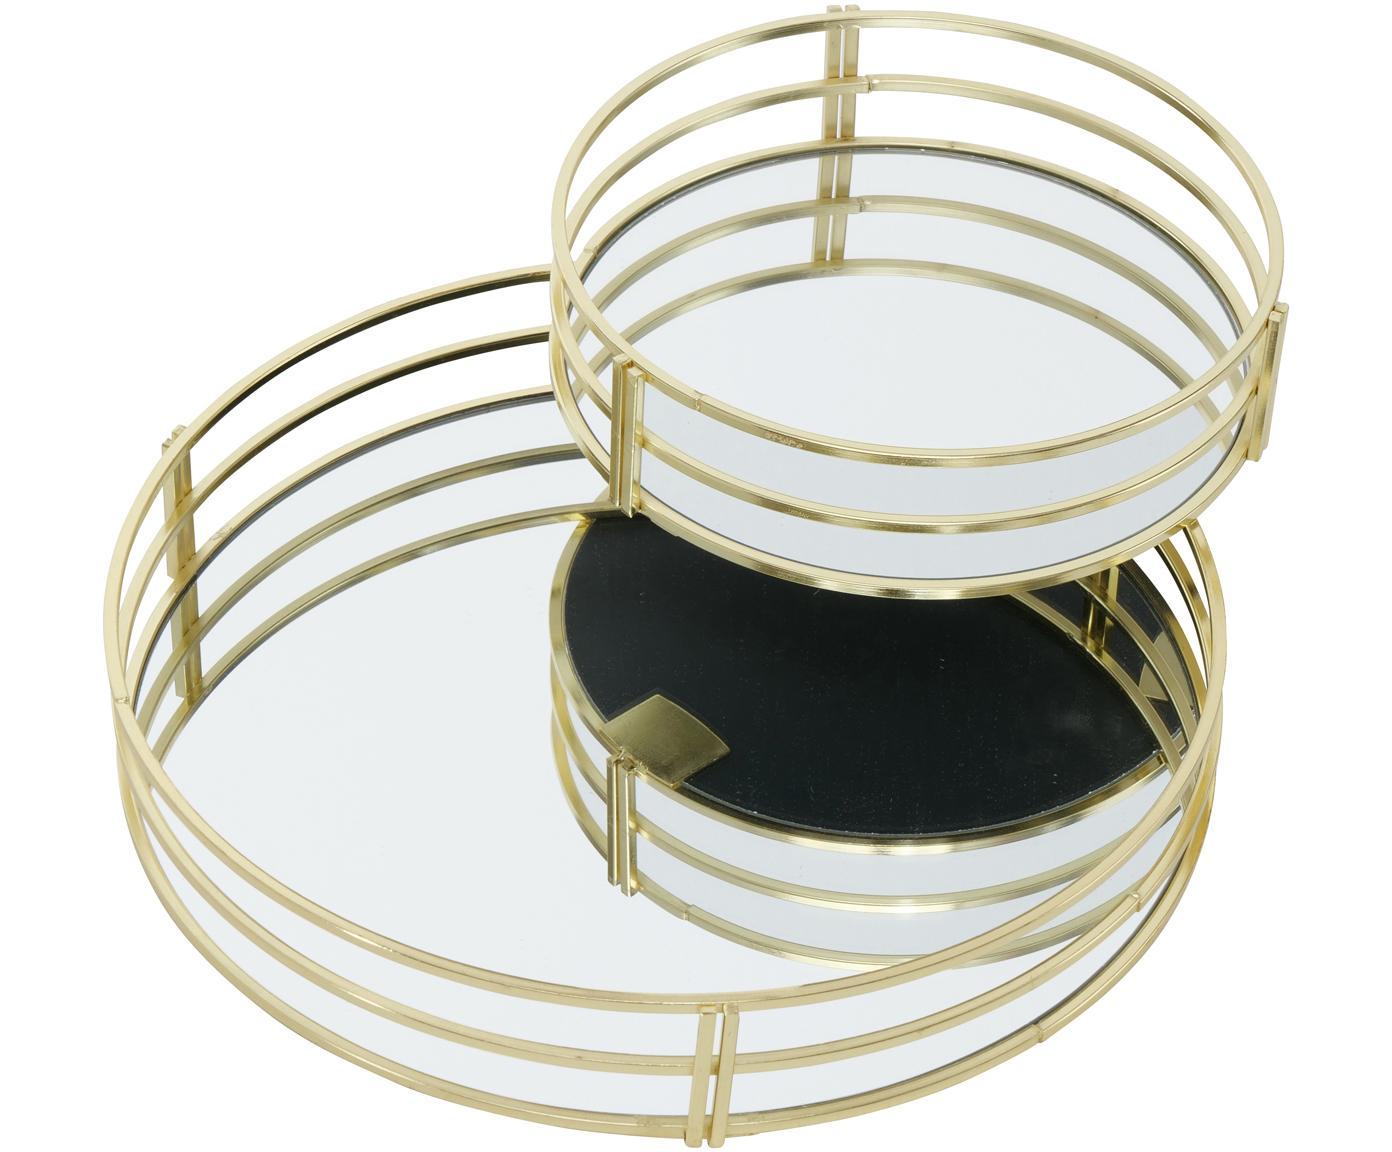 Deko-Tablett-Set Sino, 2-tlg., Metall, Spiegelglas, Messingfarben, Sondergrößen